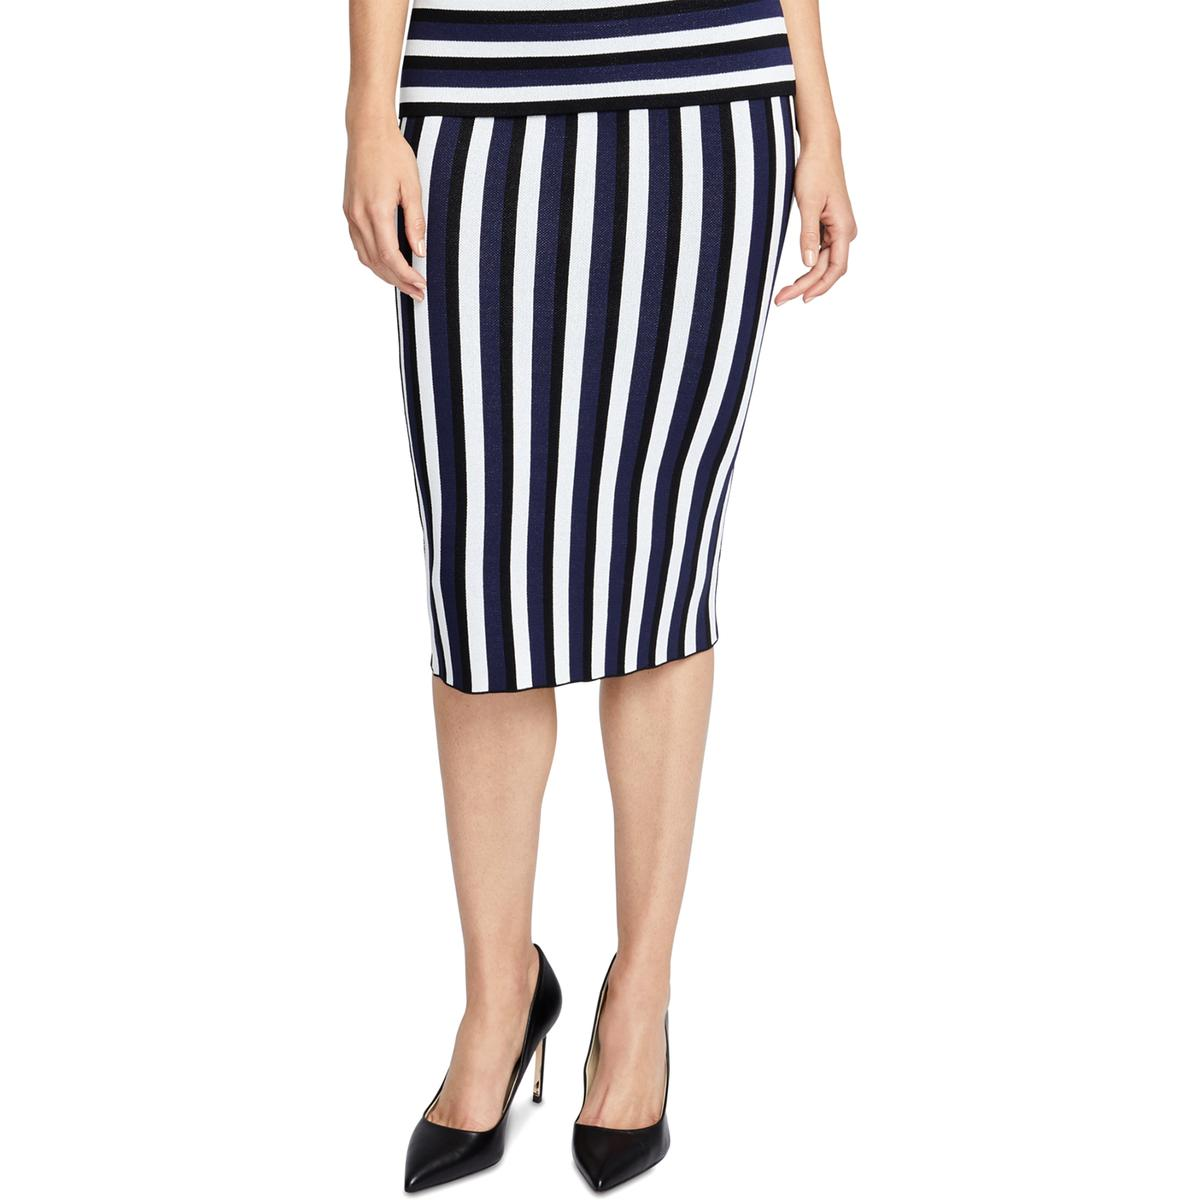 RACHEL Rachel Roy Women/'s Stretch Striped Pencil Skirt Medium M Black Gold $89